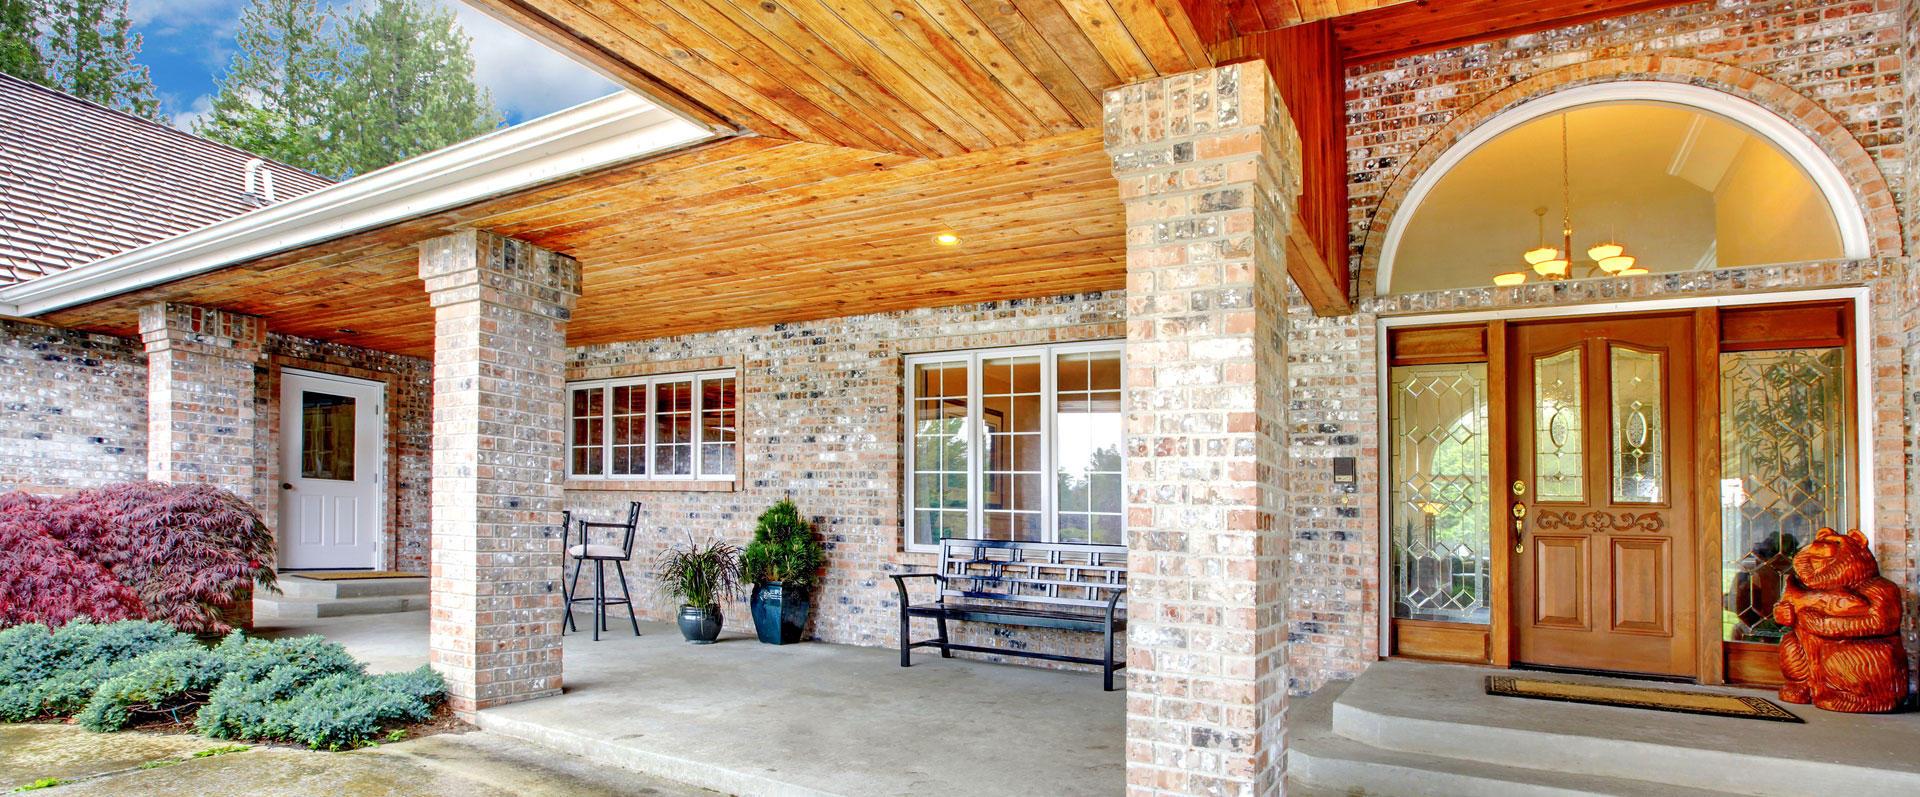 Loveland Siding & Windows By Steve Colby Construction